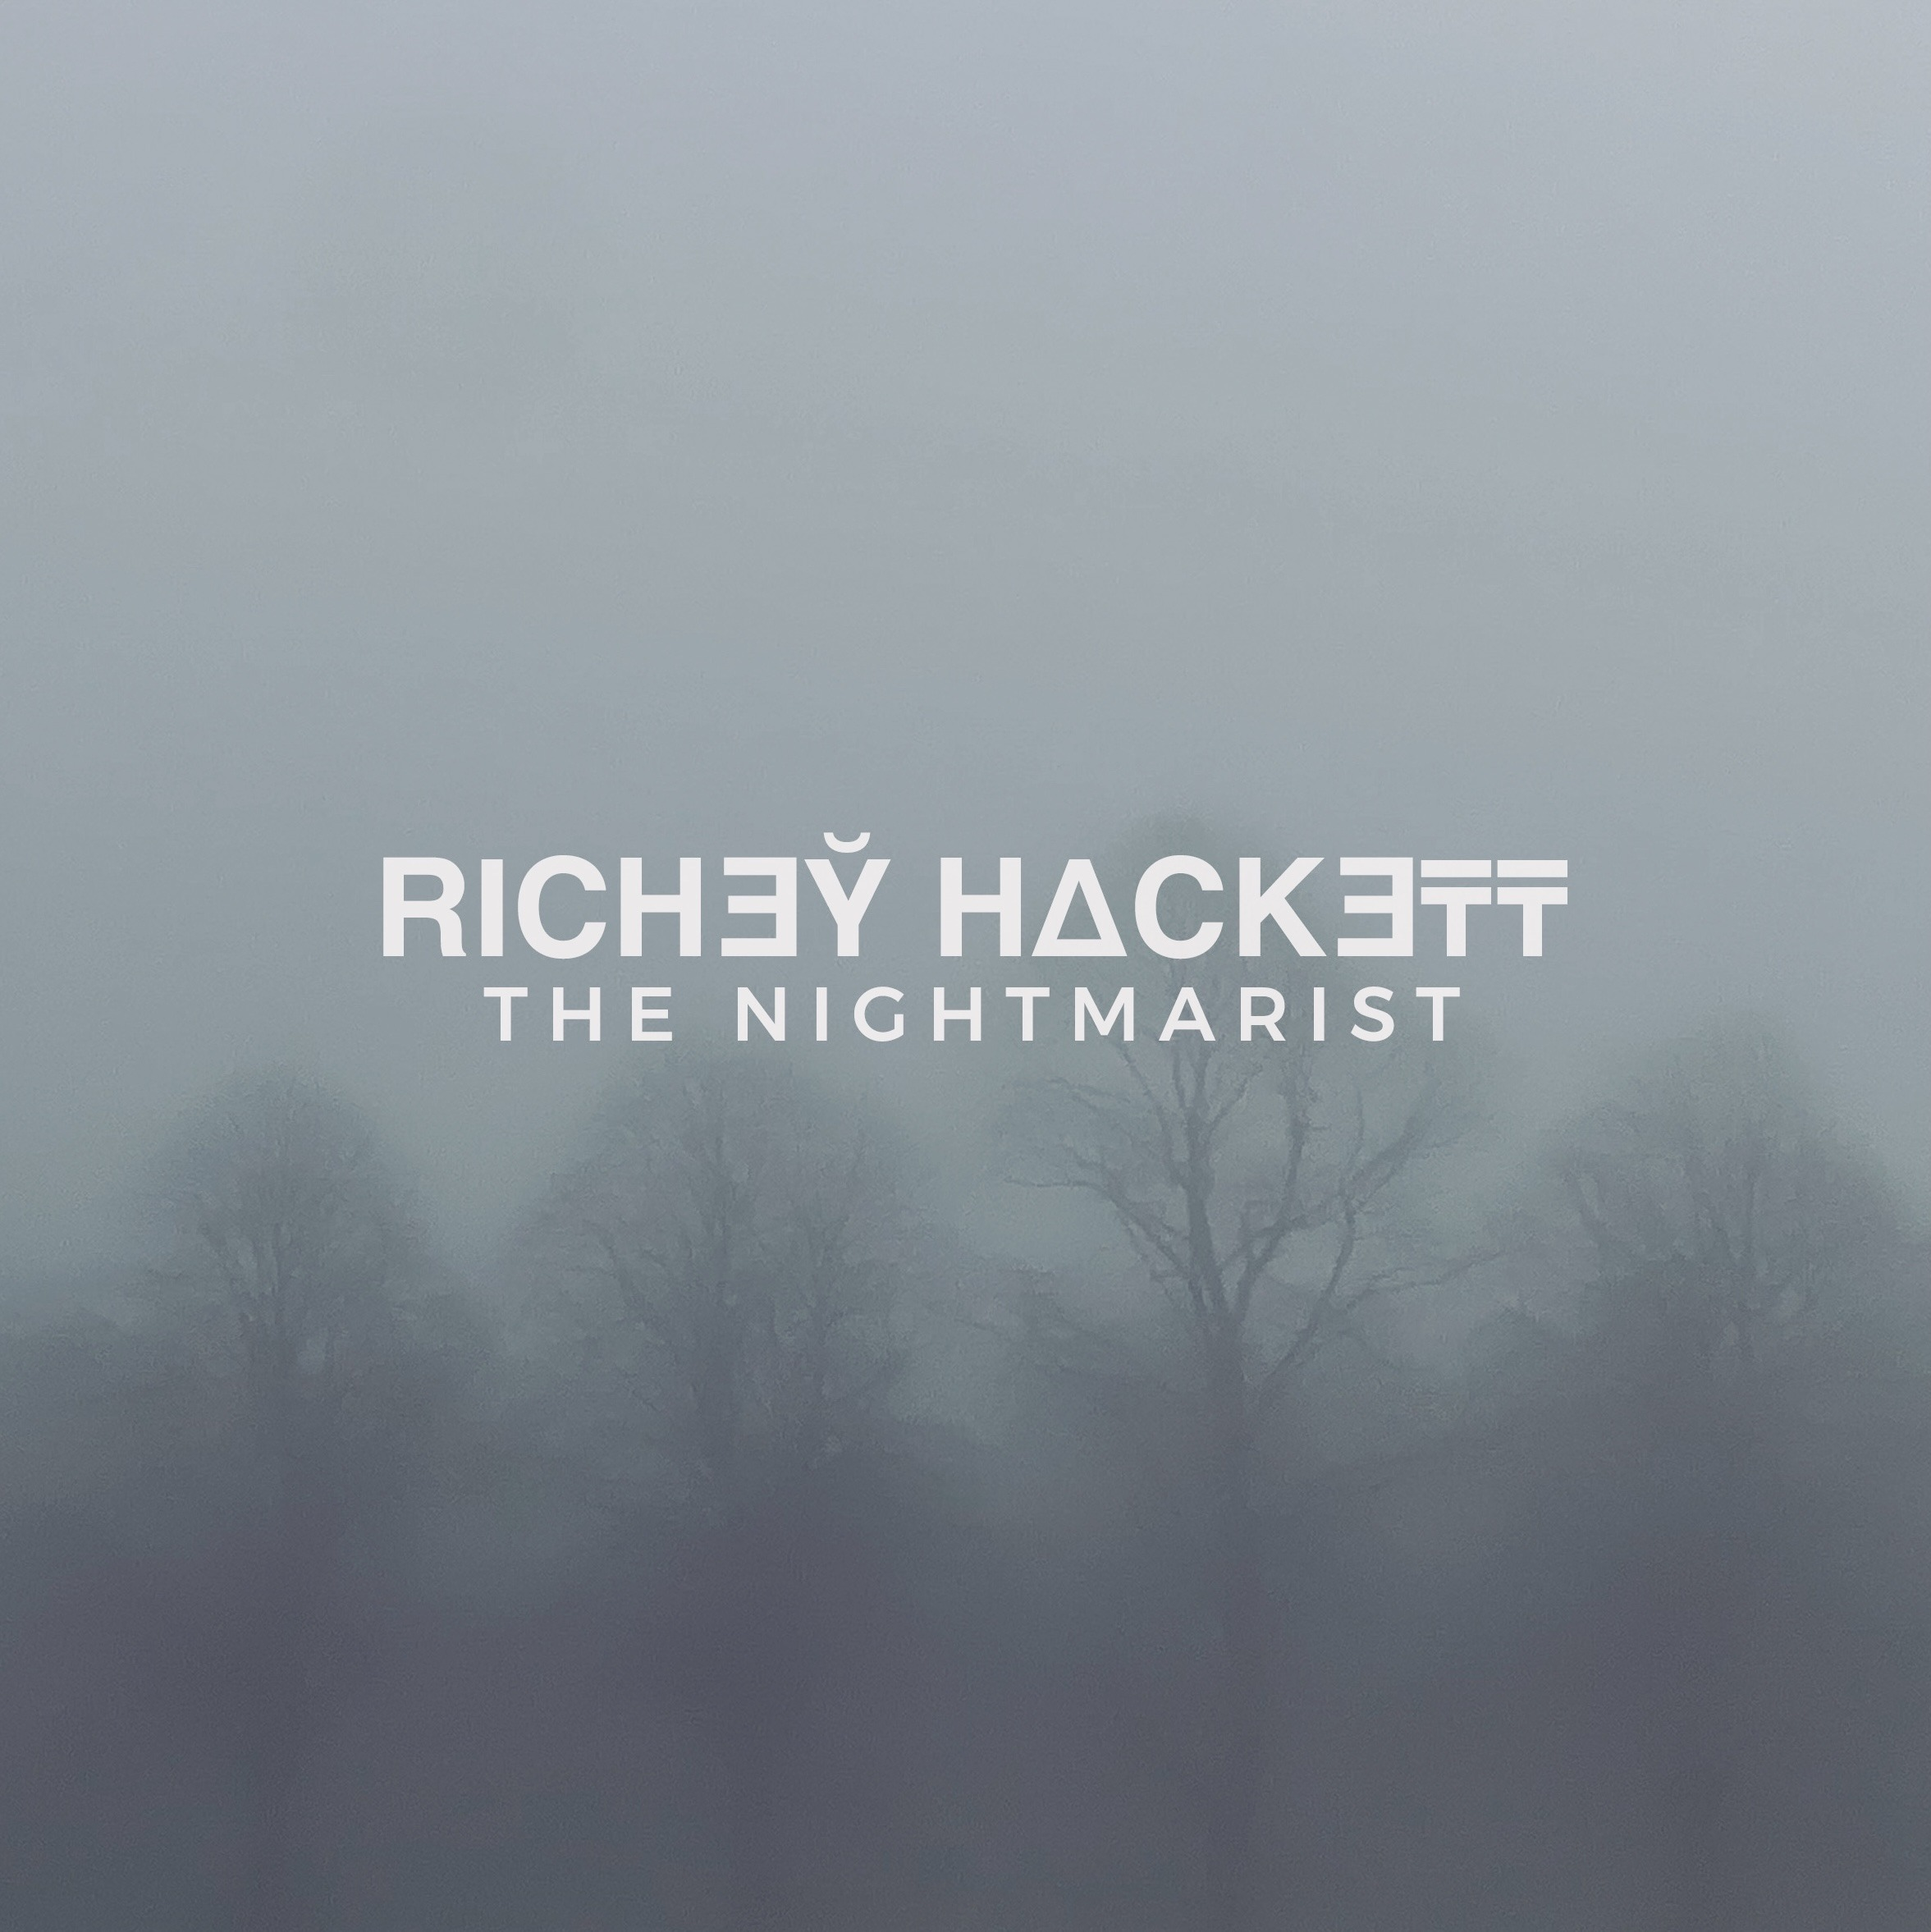 NEWS: Richey Hackett releases cinematic ambient album 'The Nightmarist'